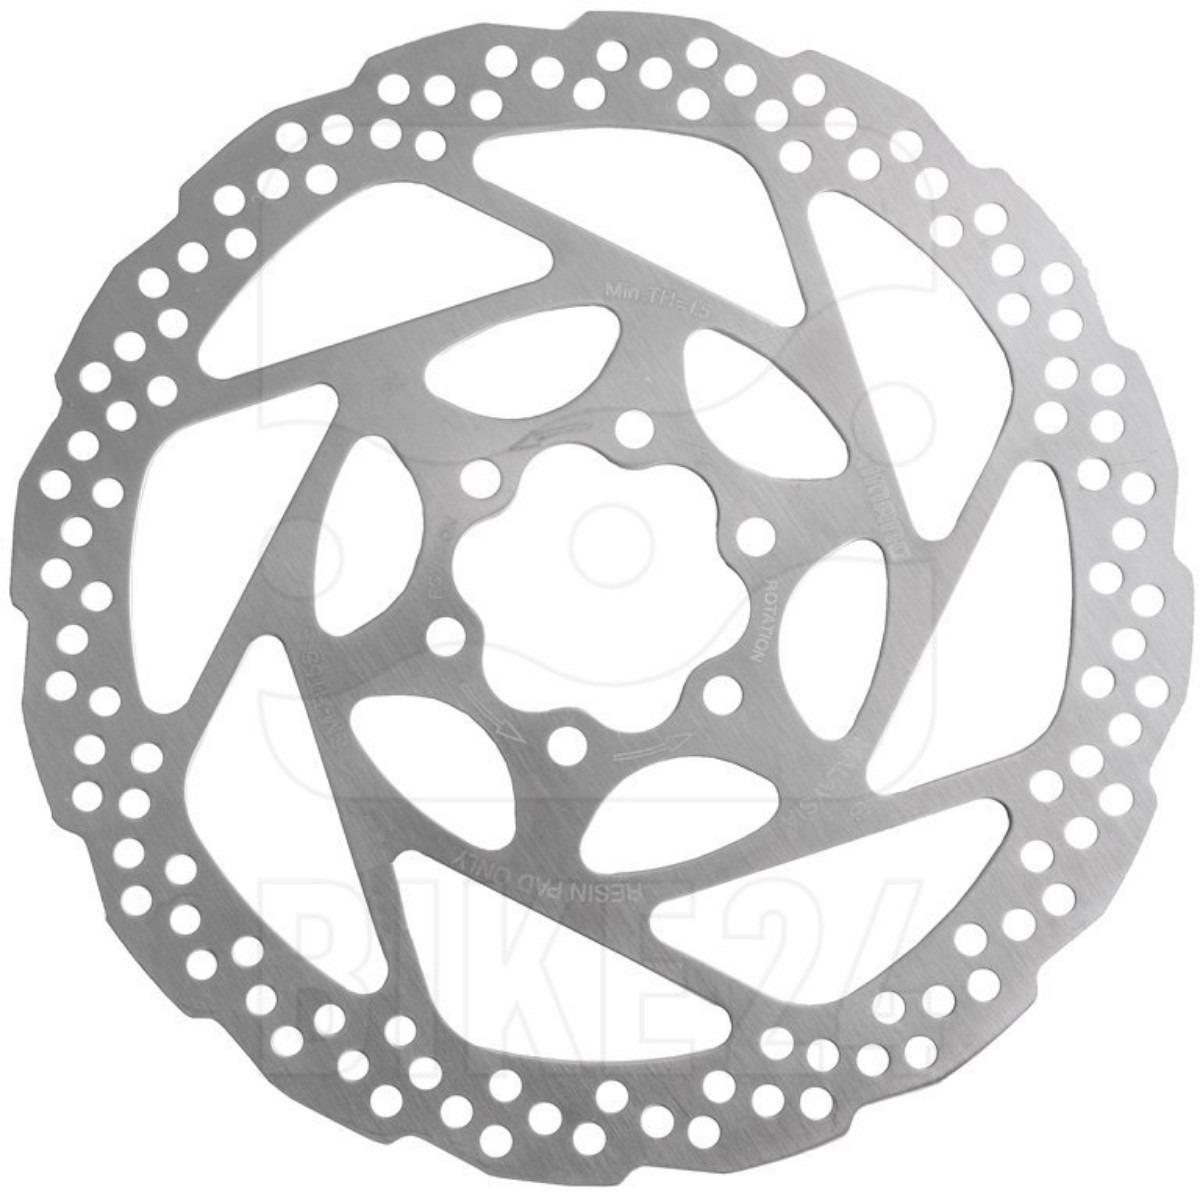 Disco de Freio Shimano SM-RT56 160mm